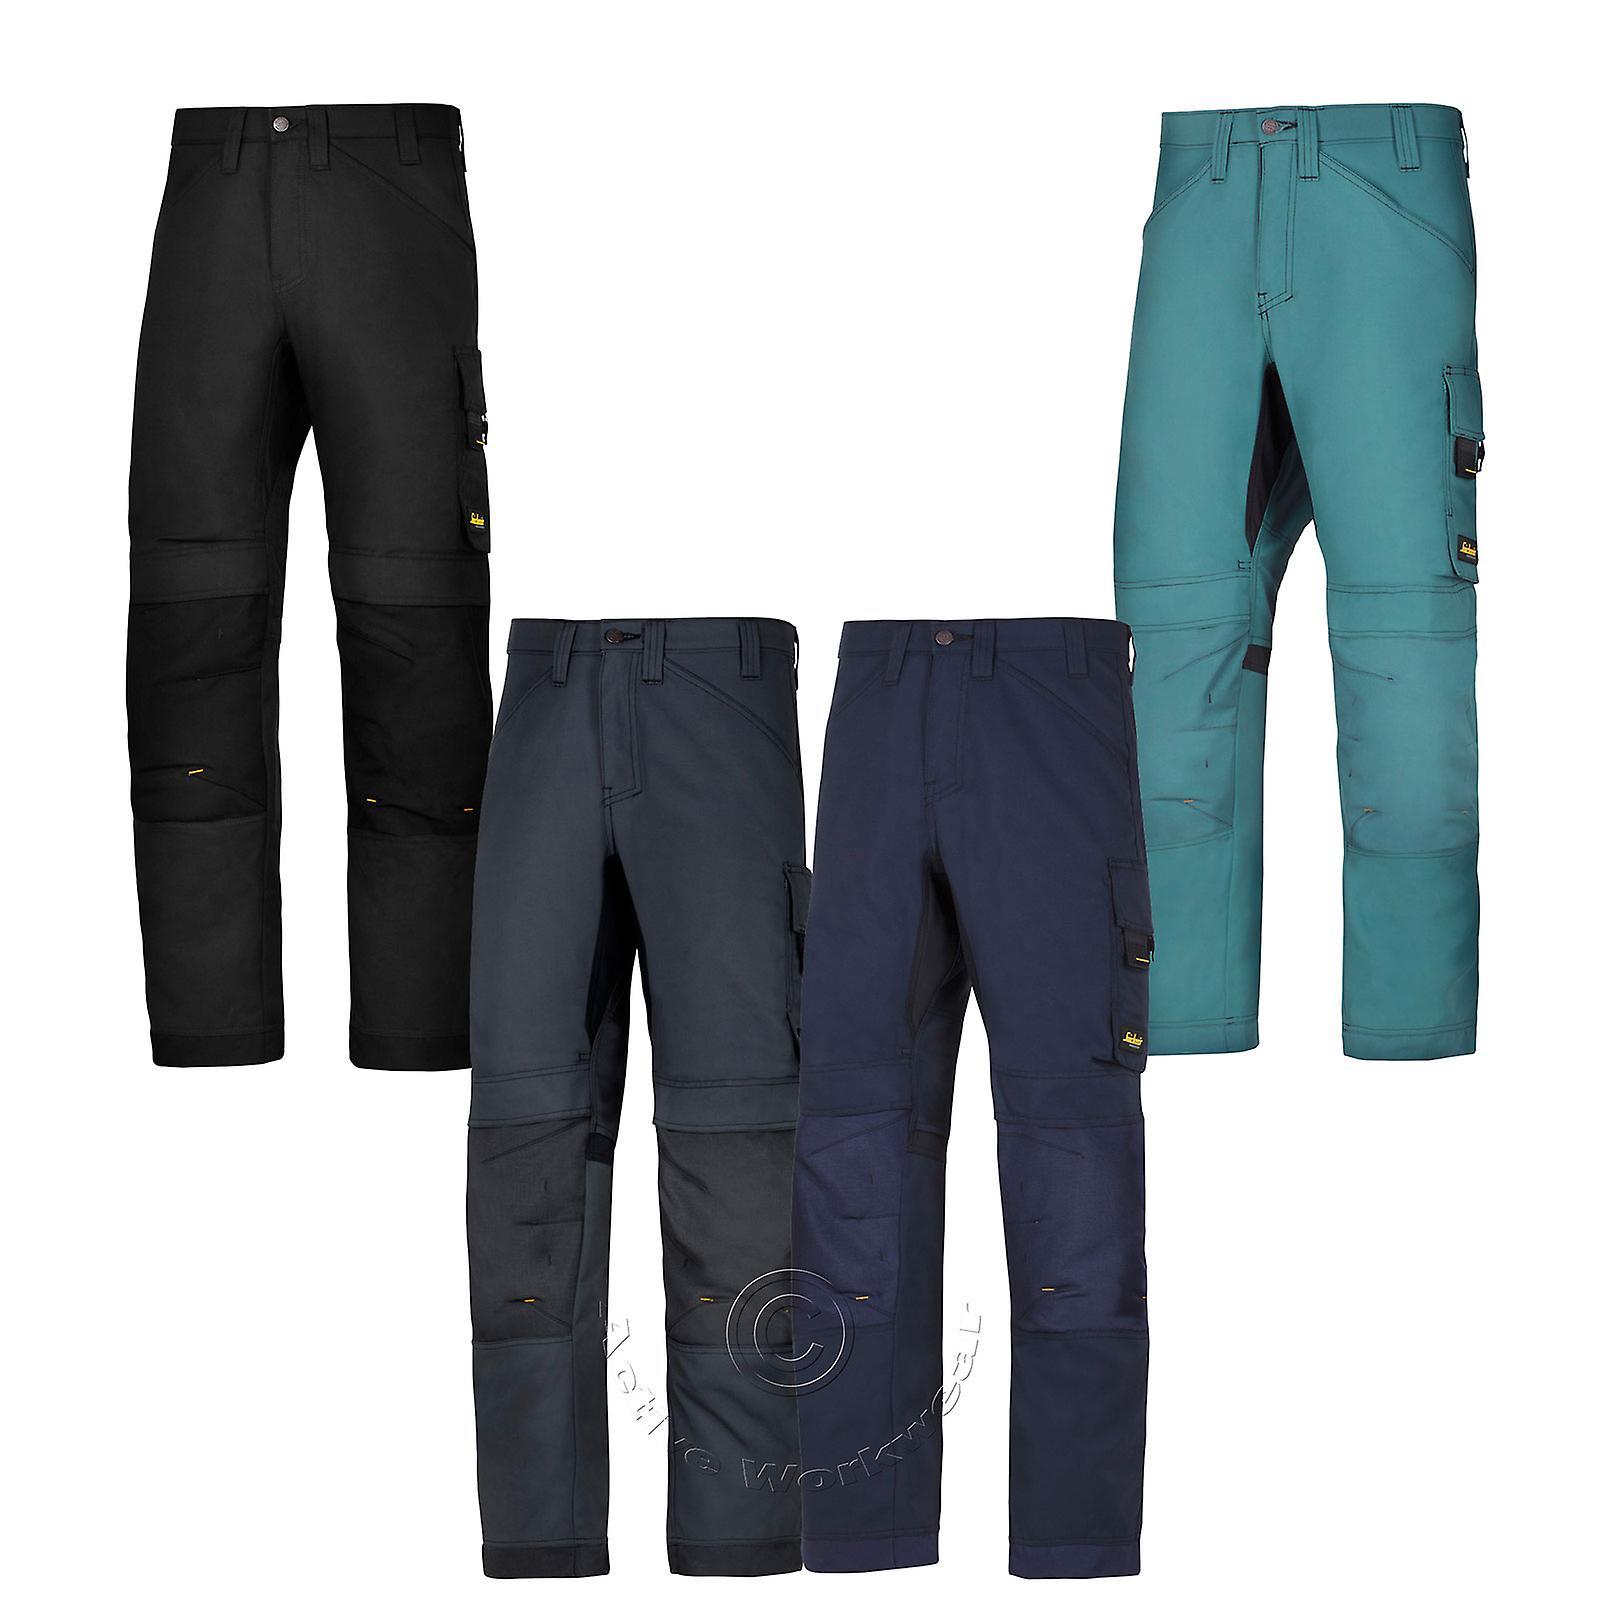 Steel Grey Modern Cordura® Work Trousers 6301 AllroundWork